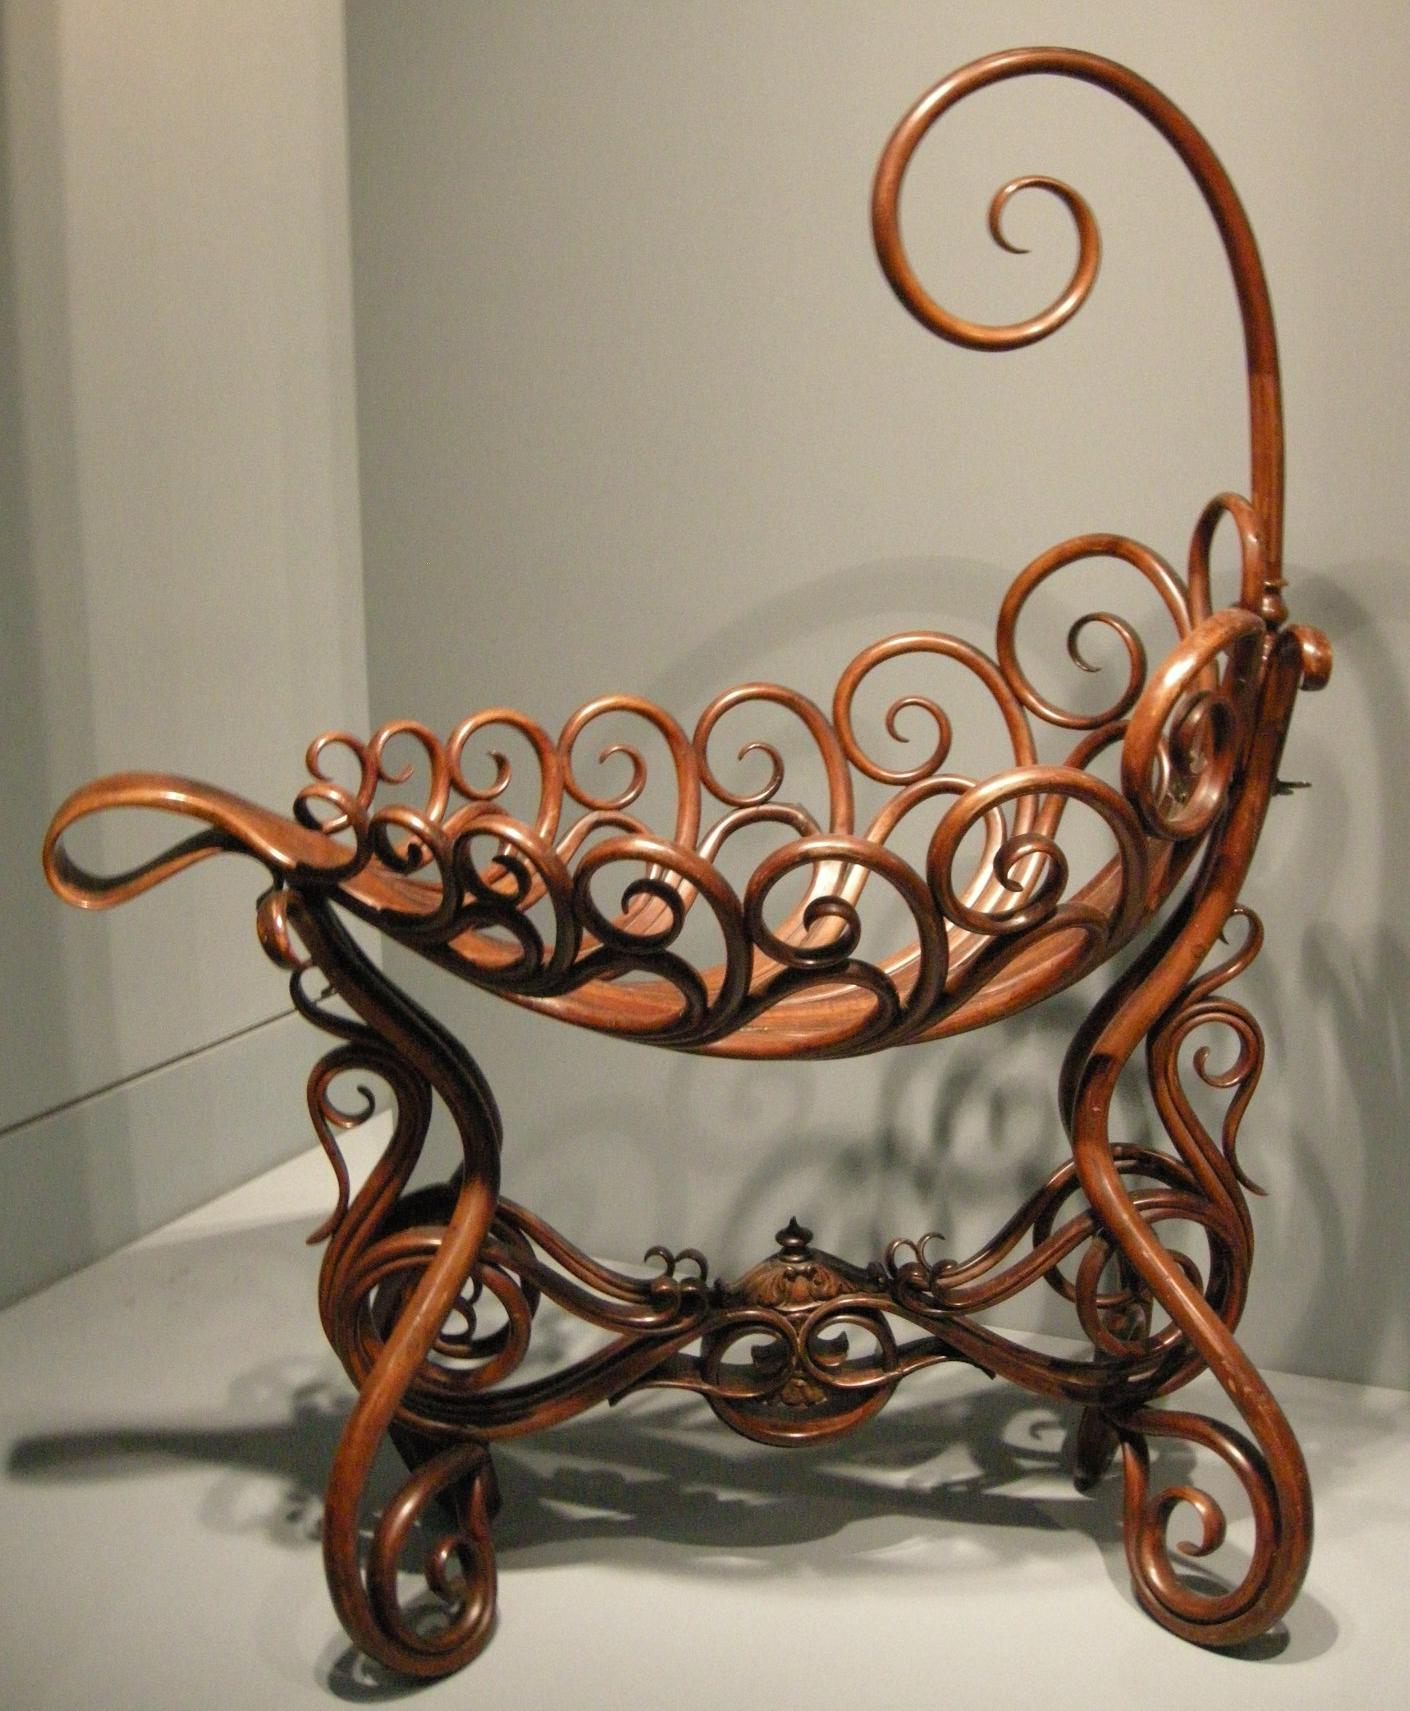 Bent Wood Rocking Chair